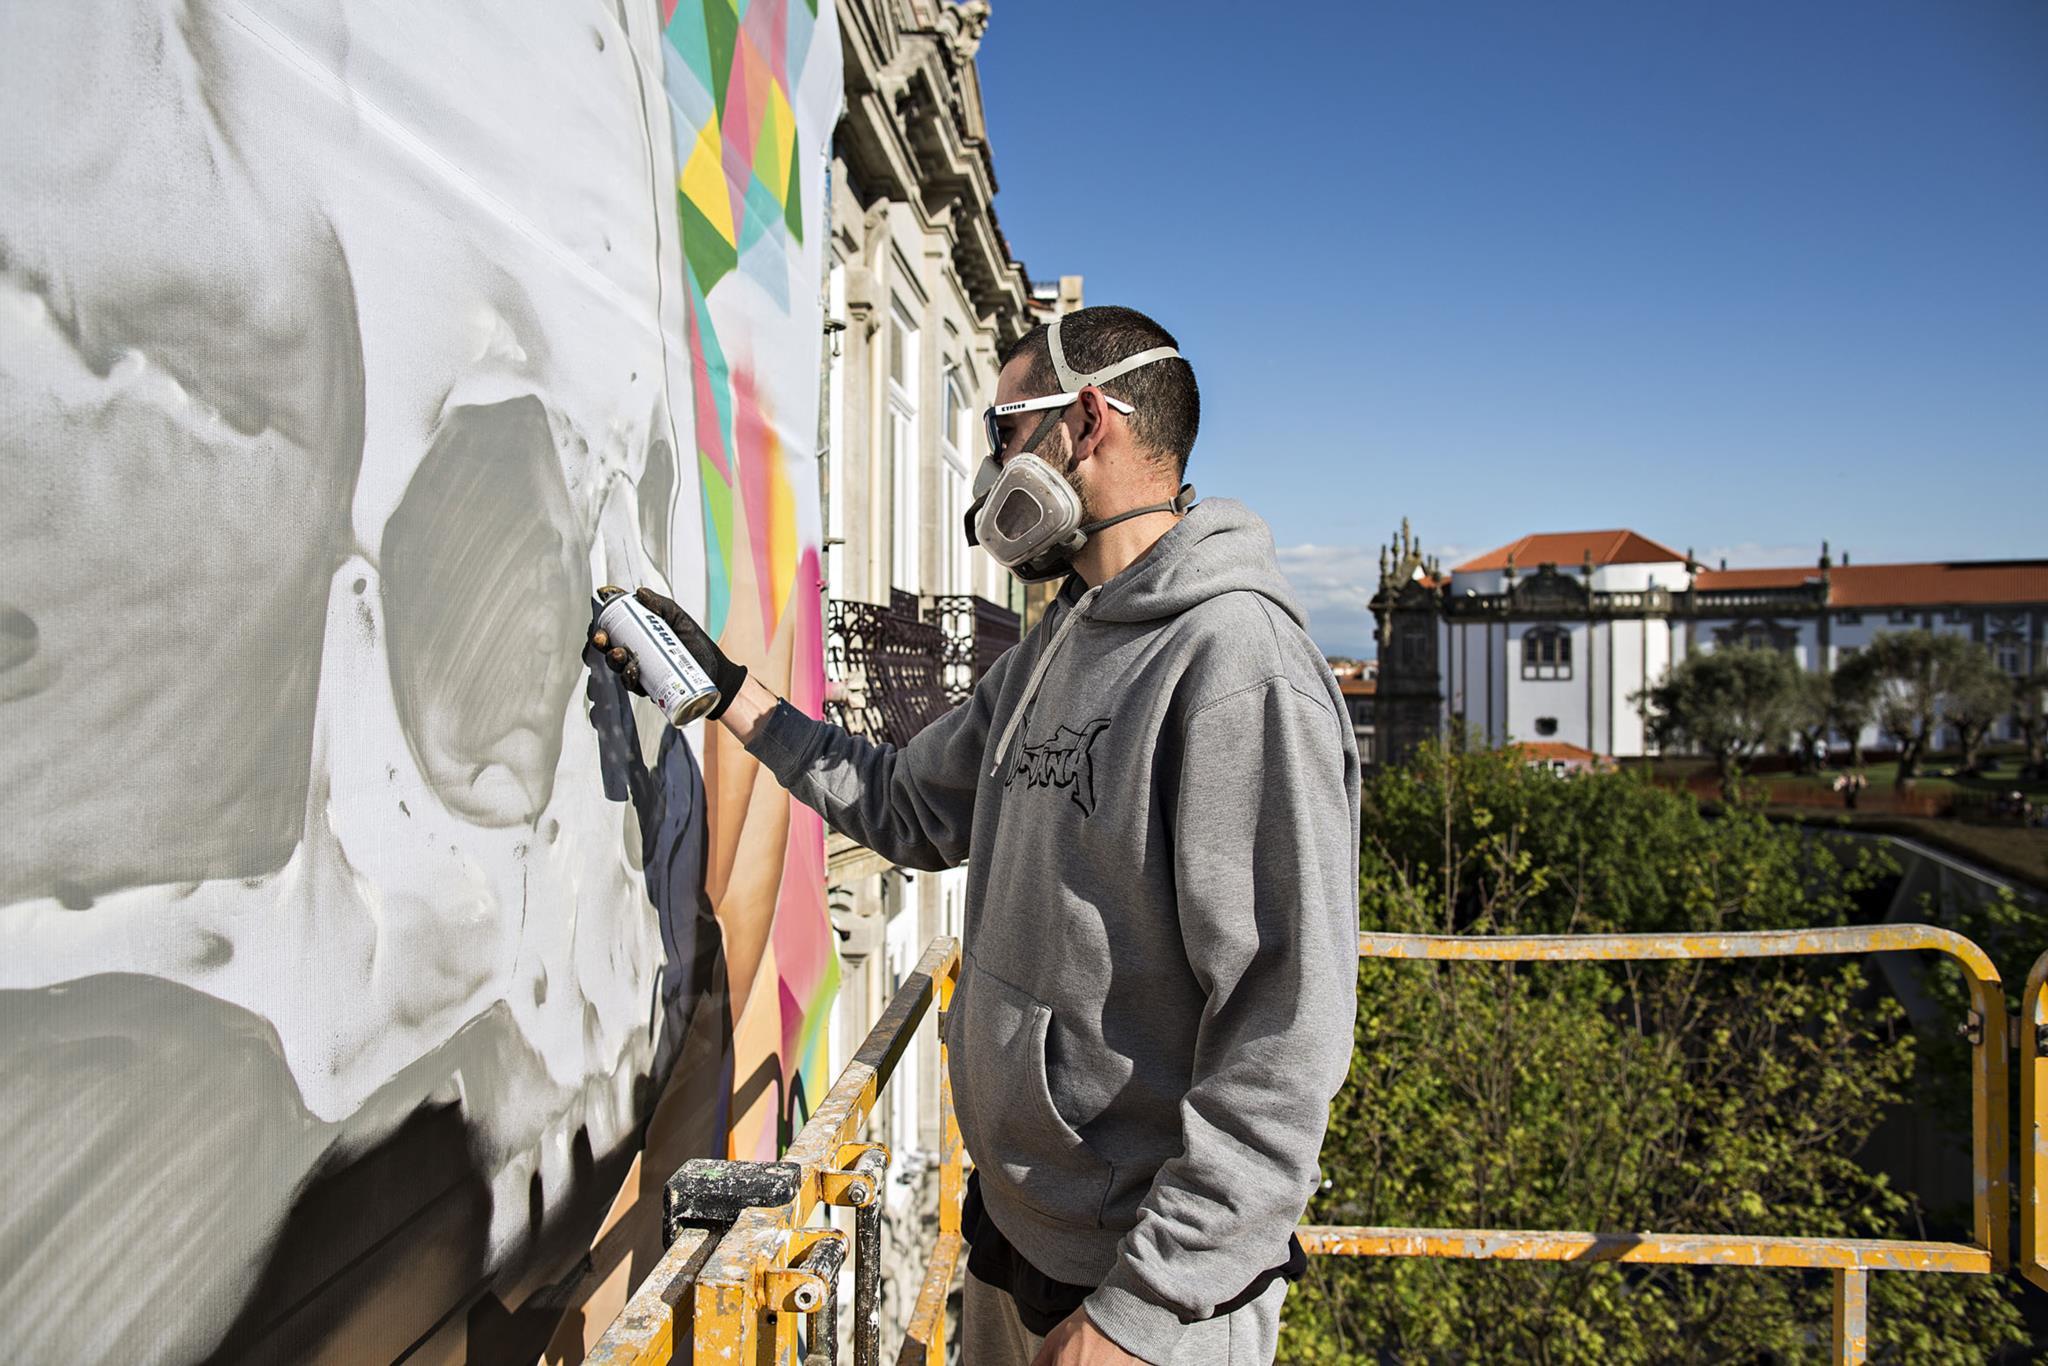 PÚBLICO - Dois graffiters portugueses na ONU